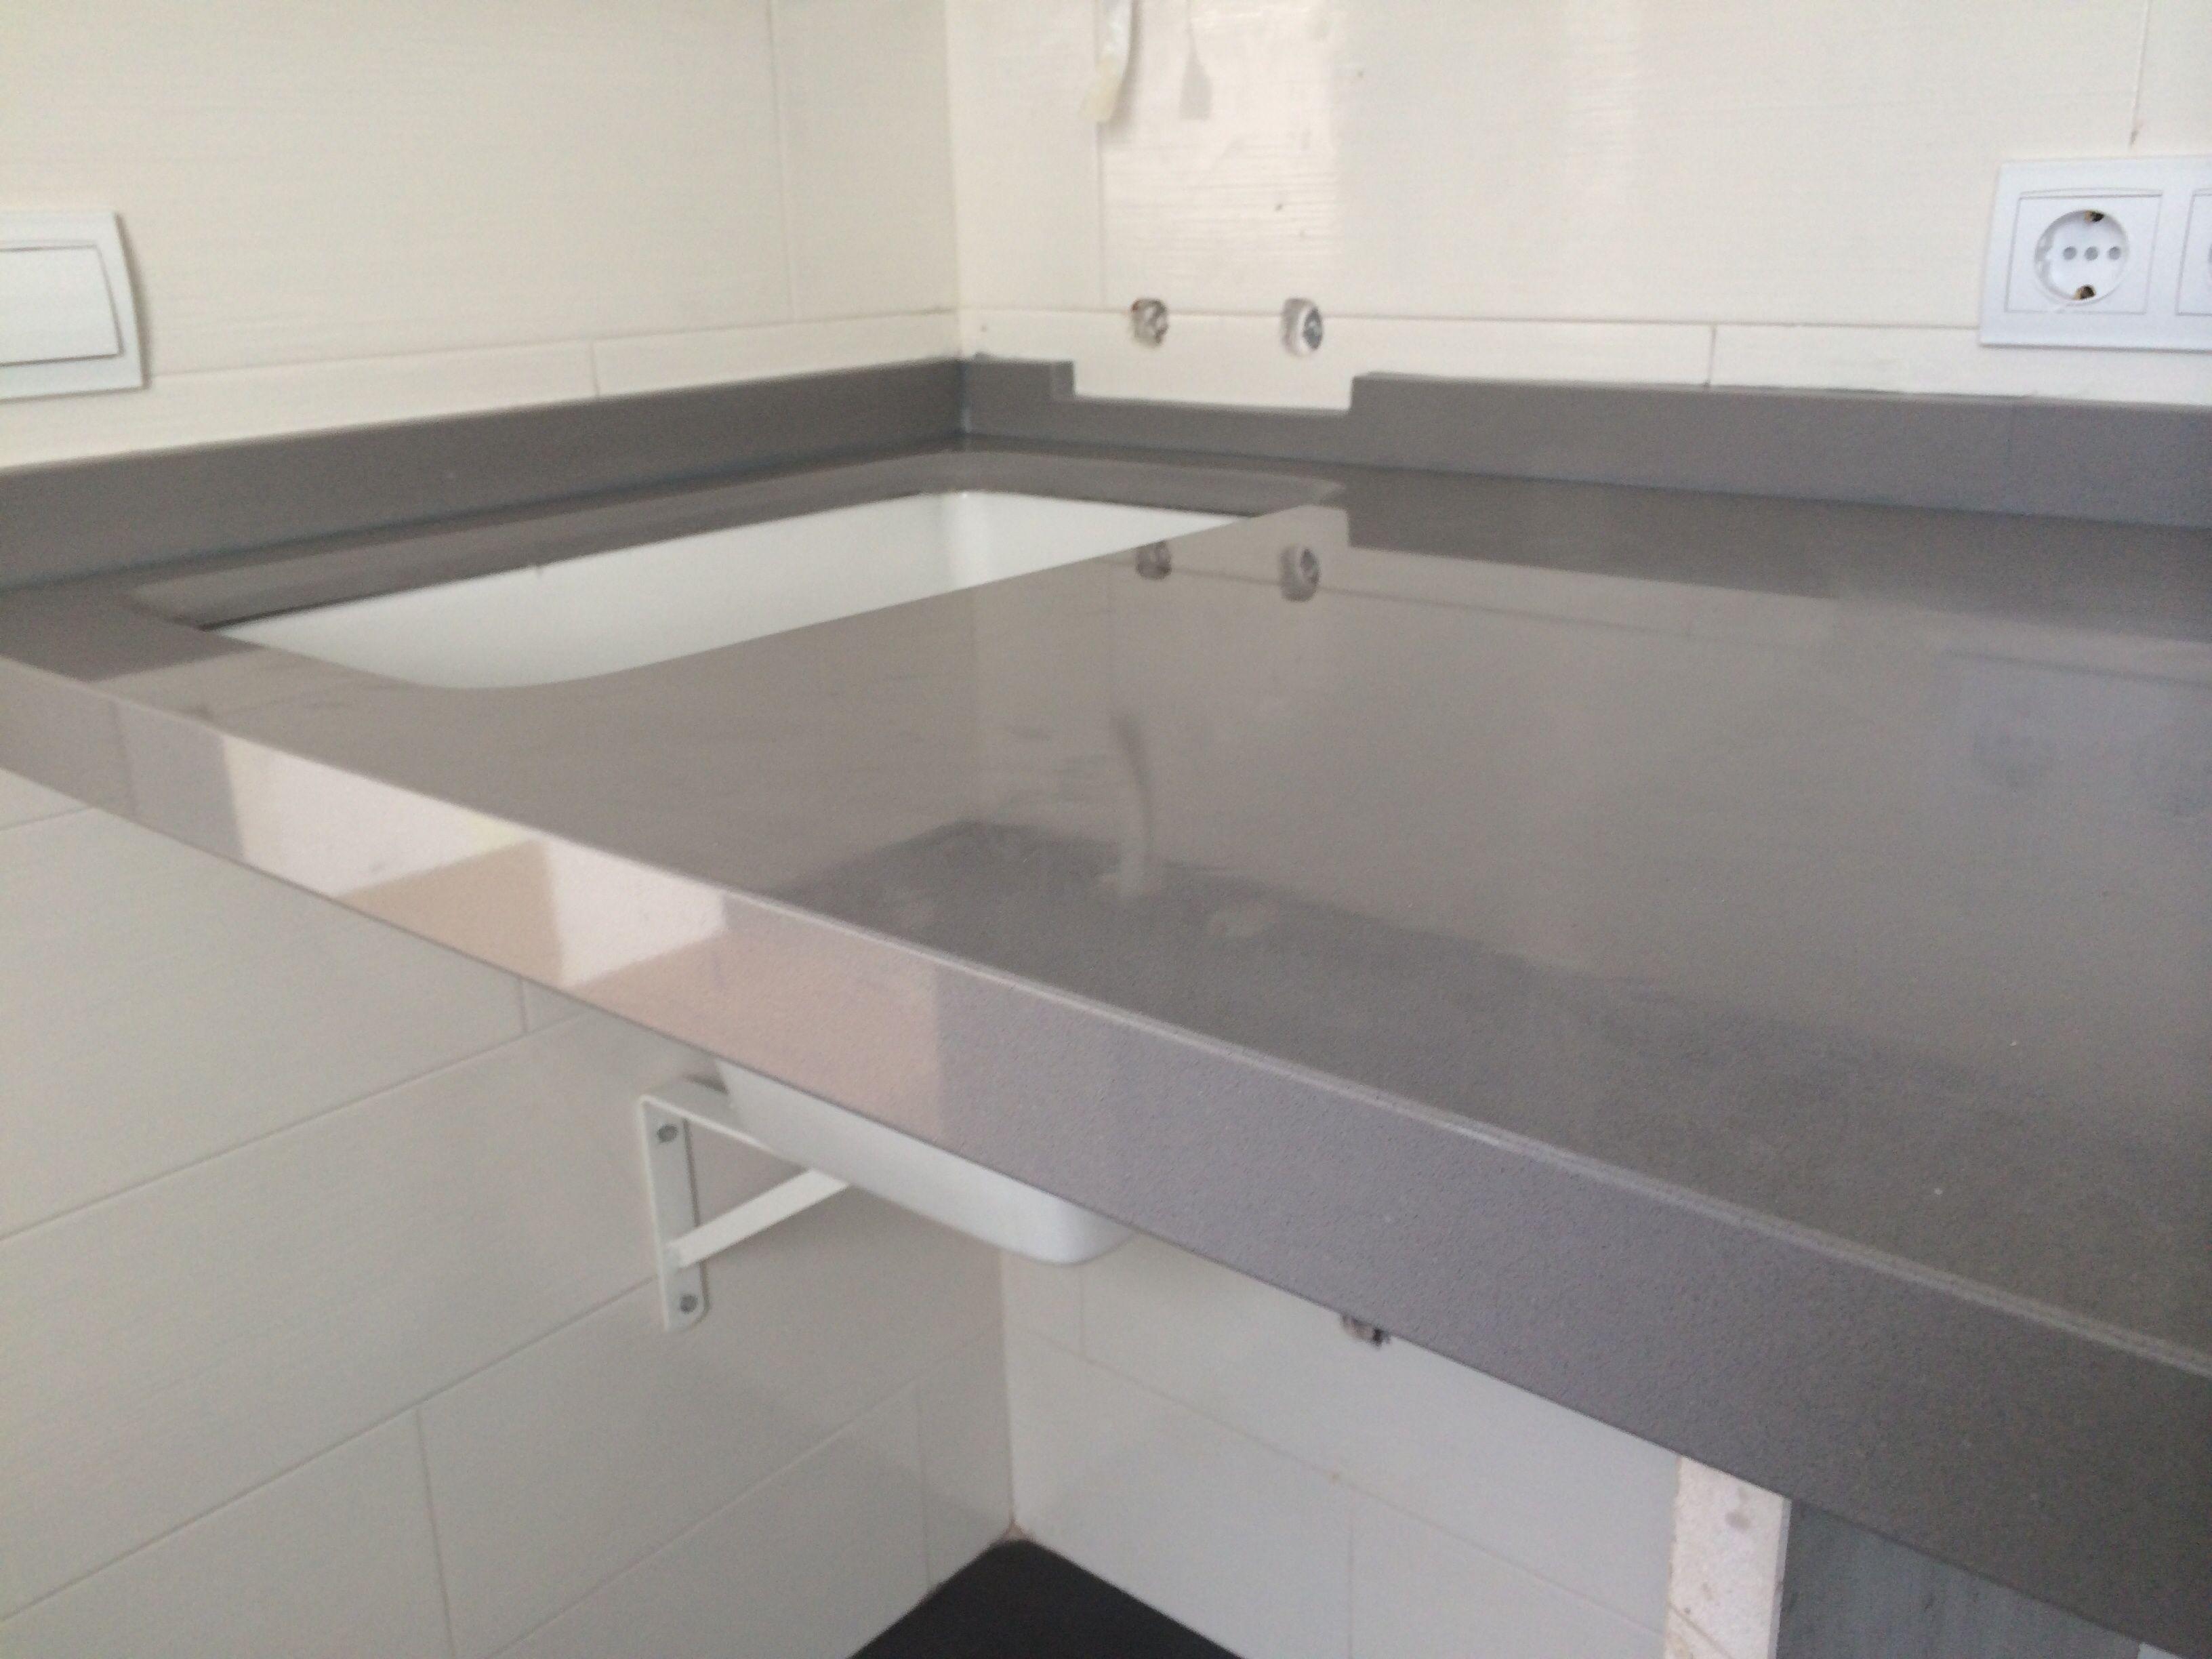 Mueble lavadero henares roca 20170806152244 for Mueble pila lavadero